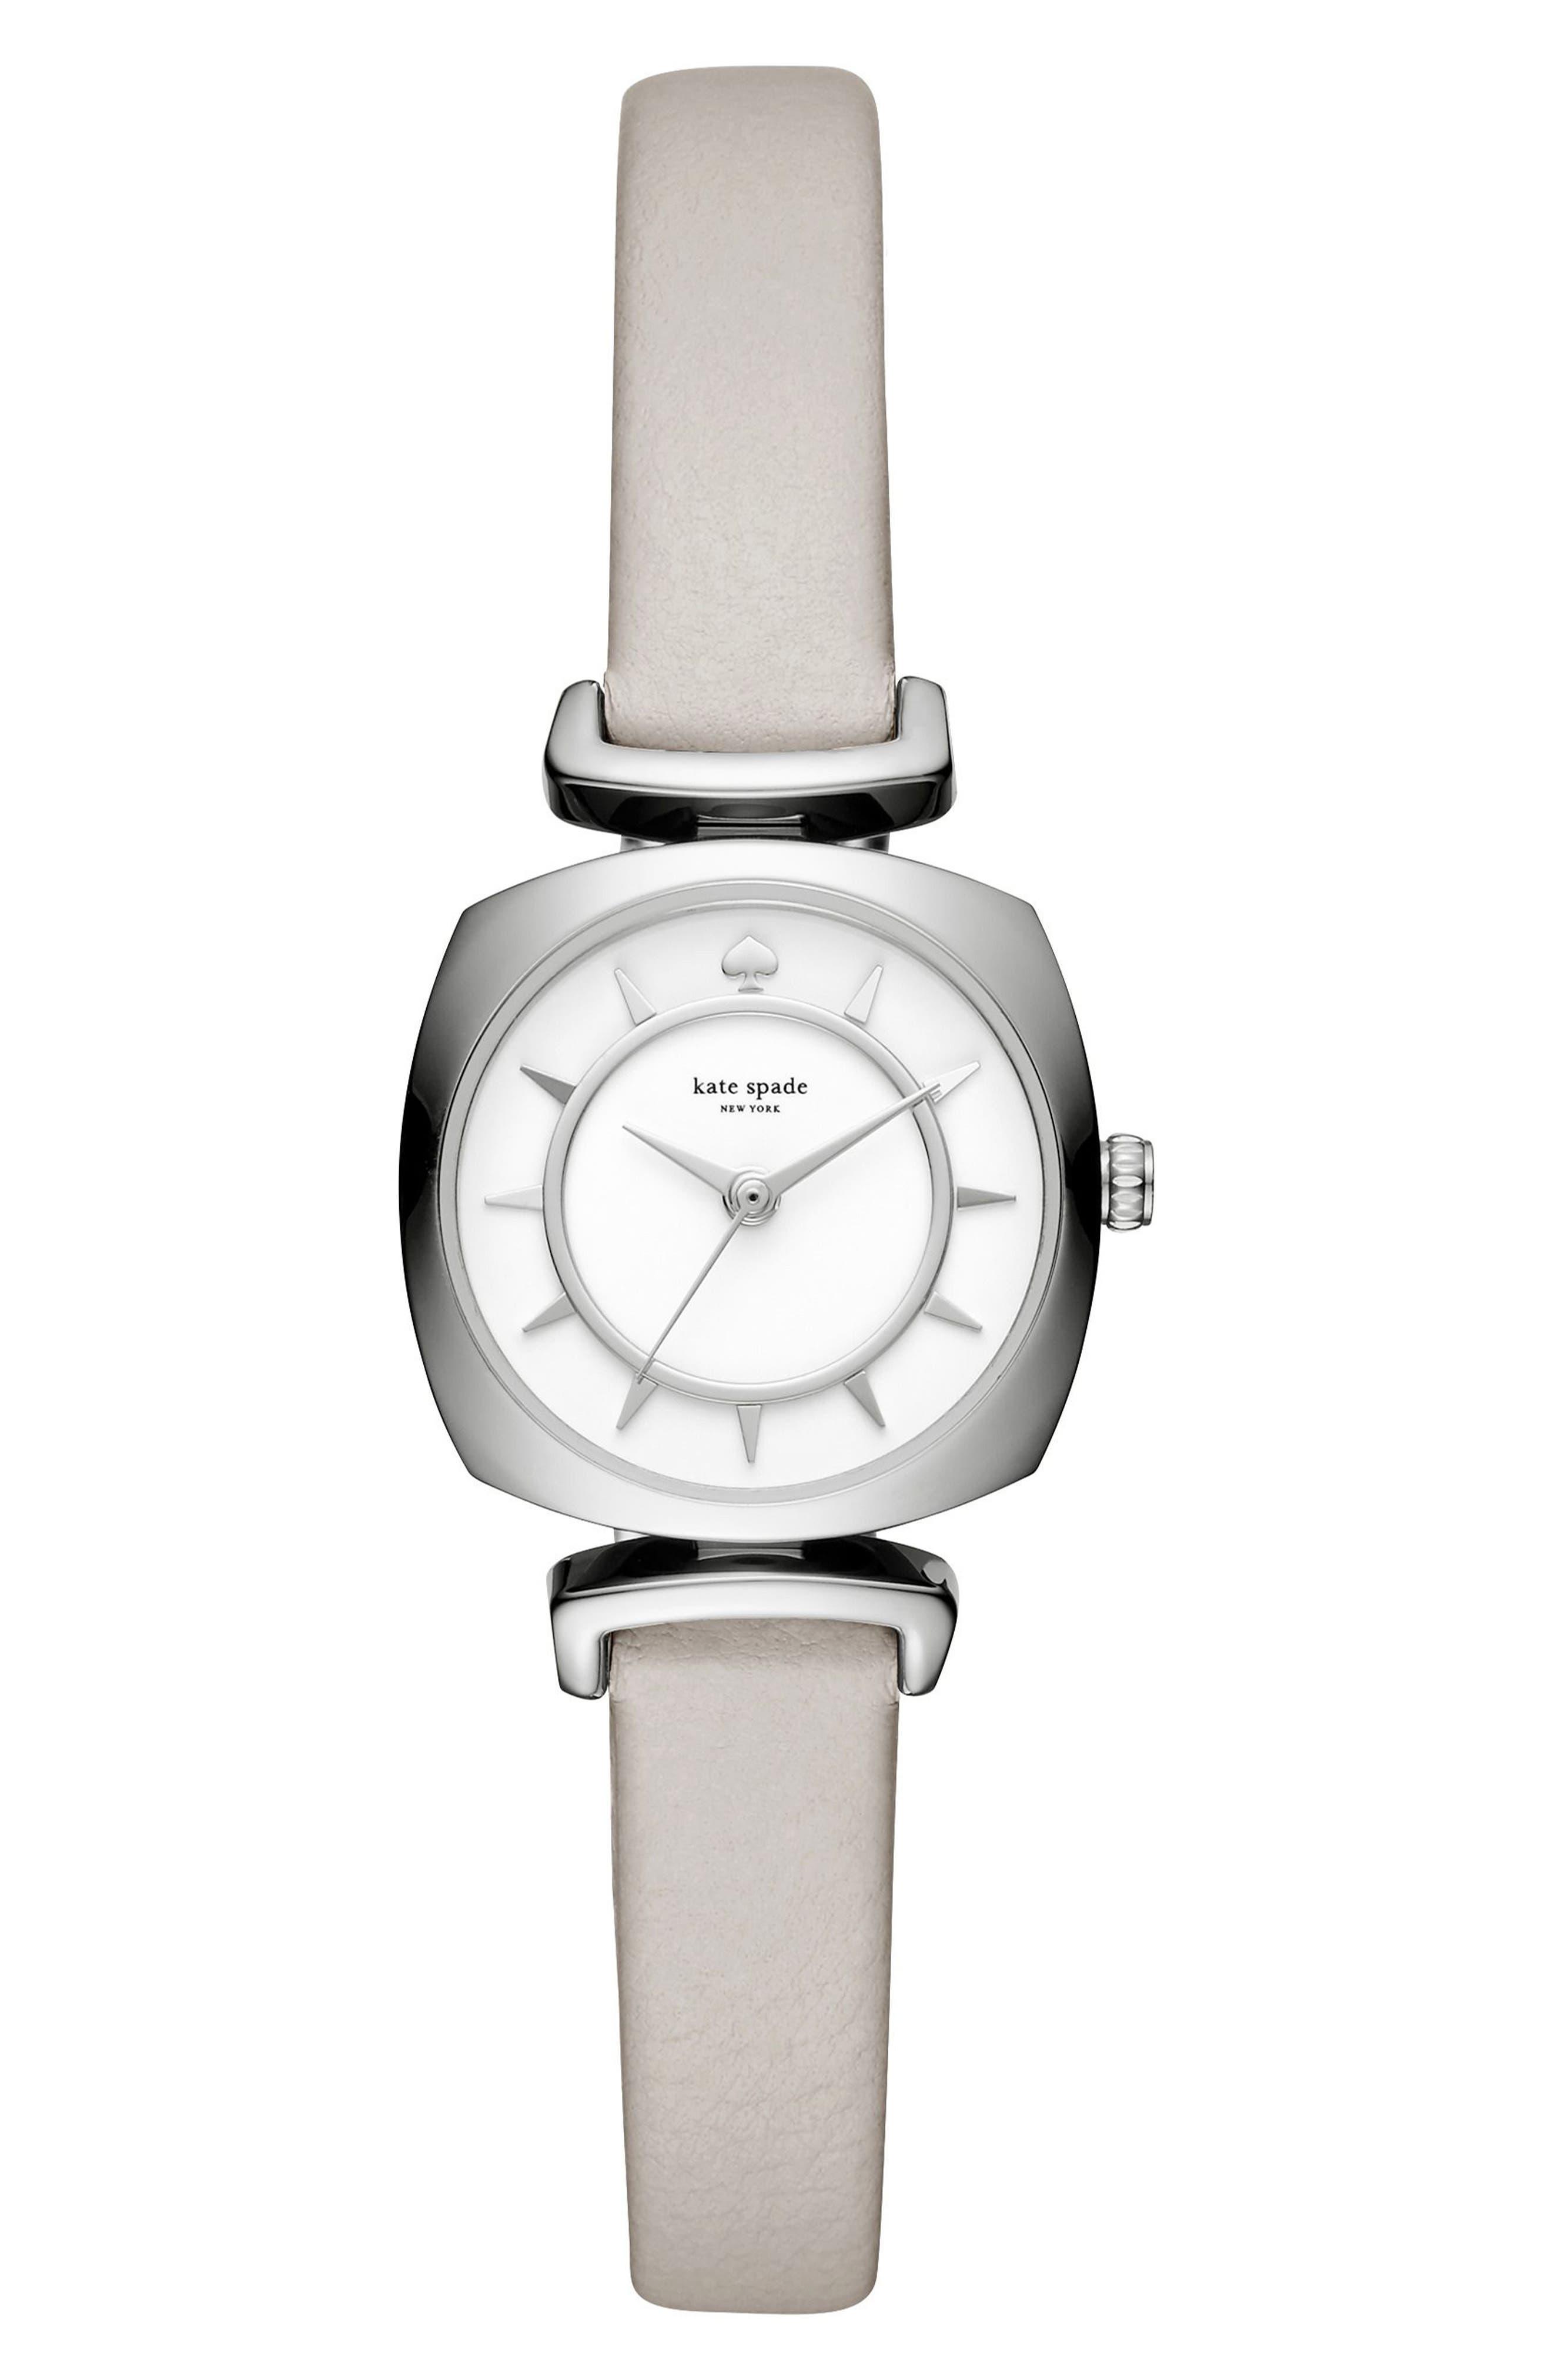 KATE SPADE NEW YORK barrow leather strap/bracelet watch, 24mm